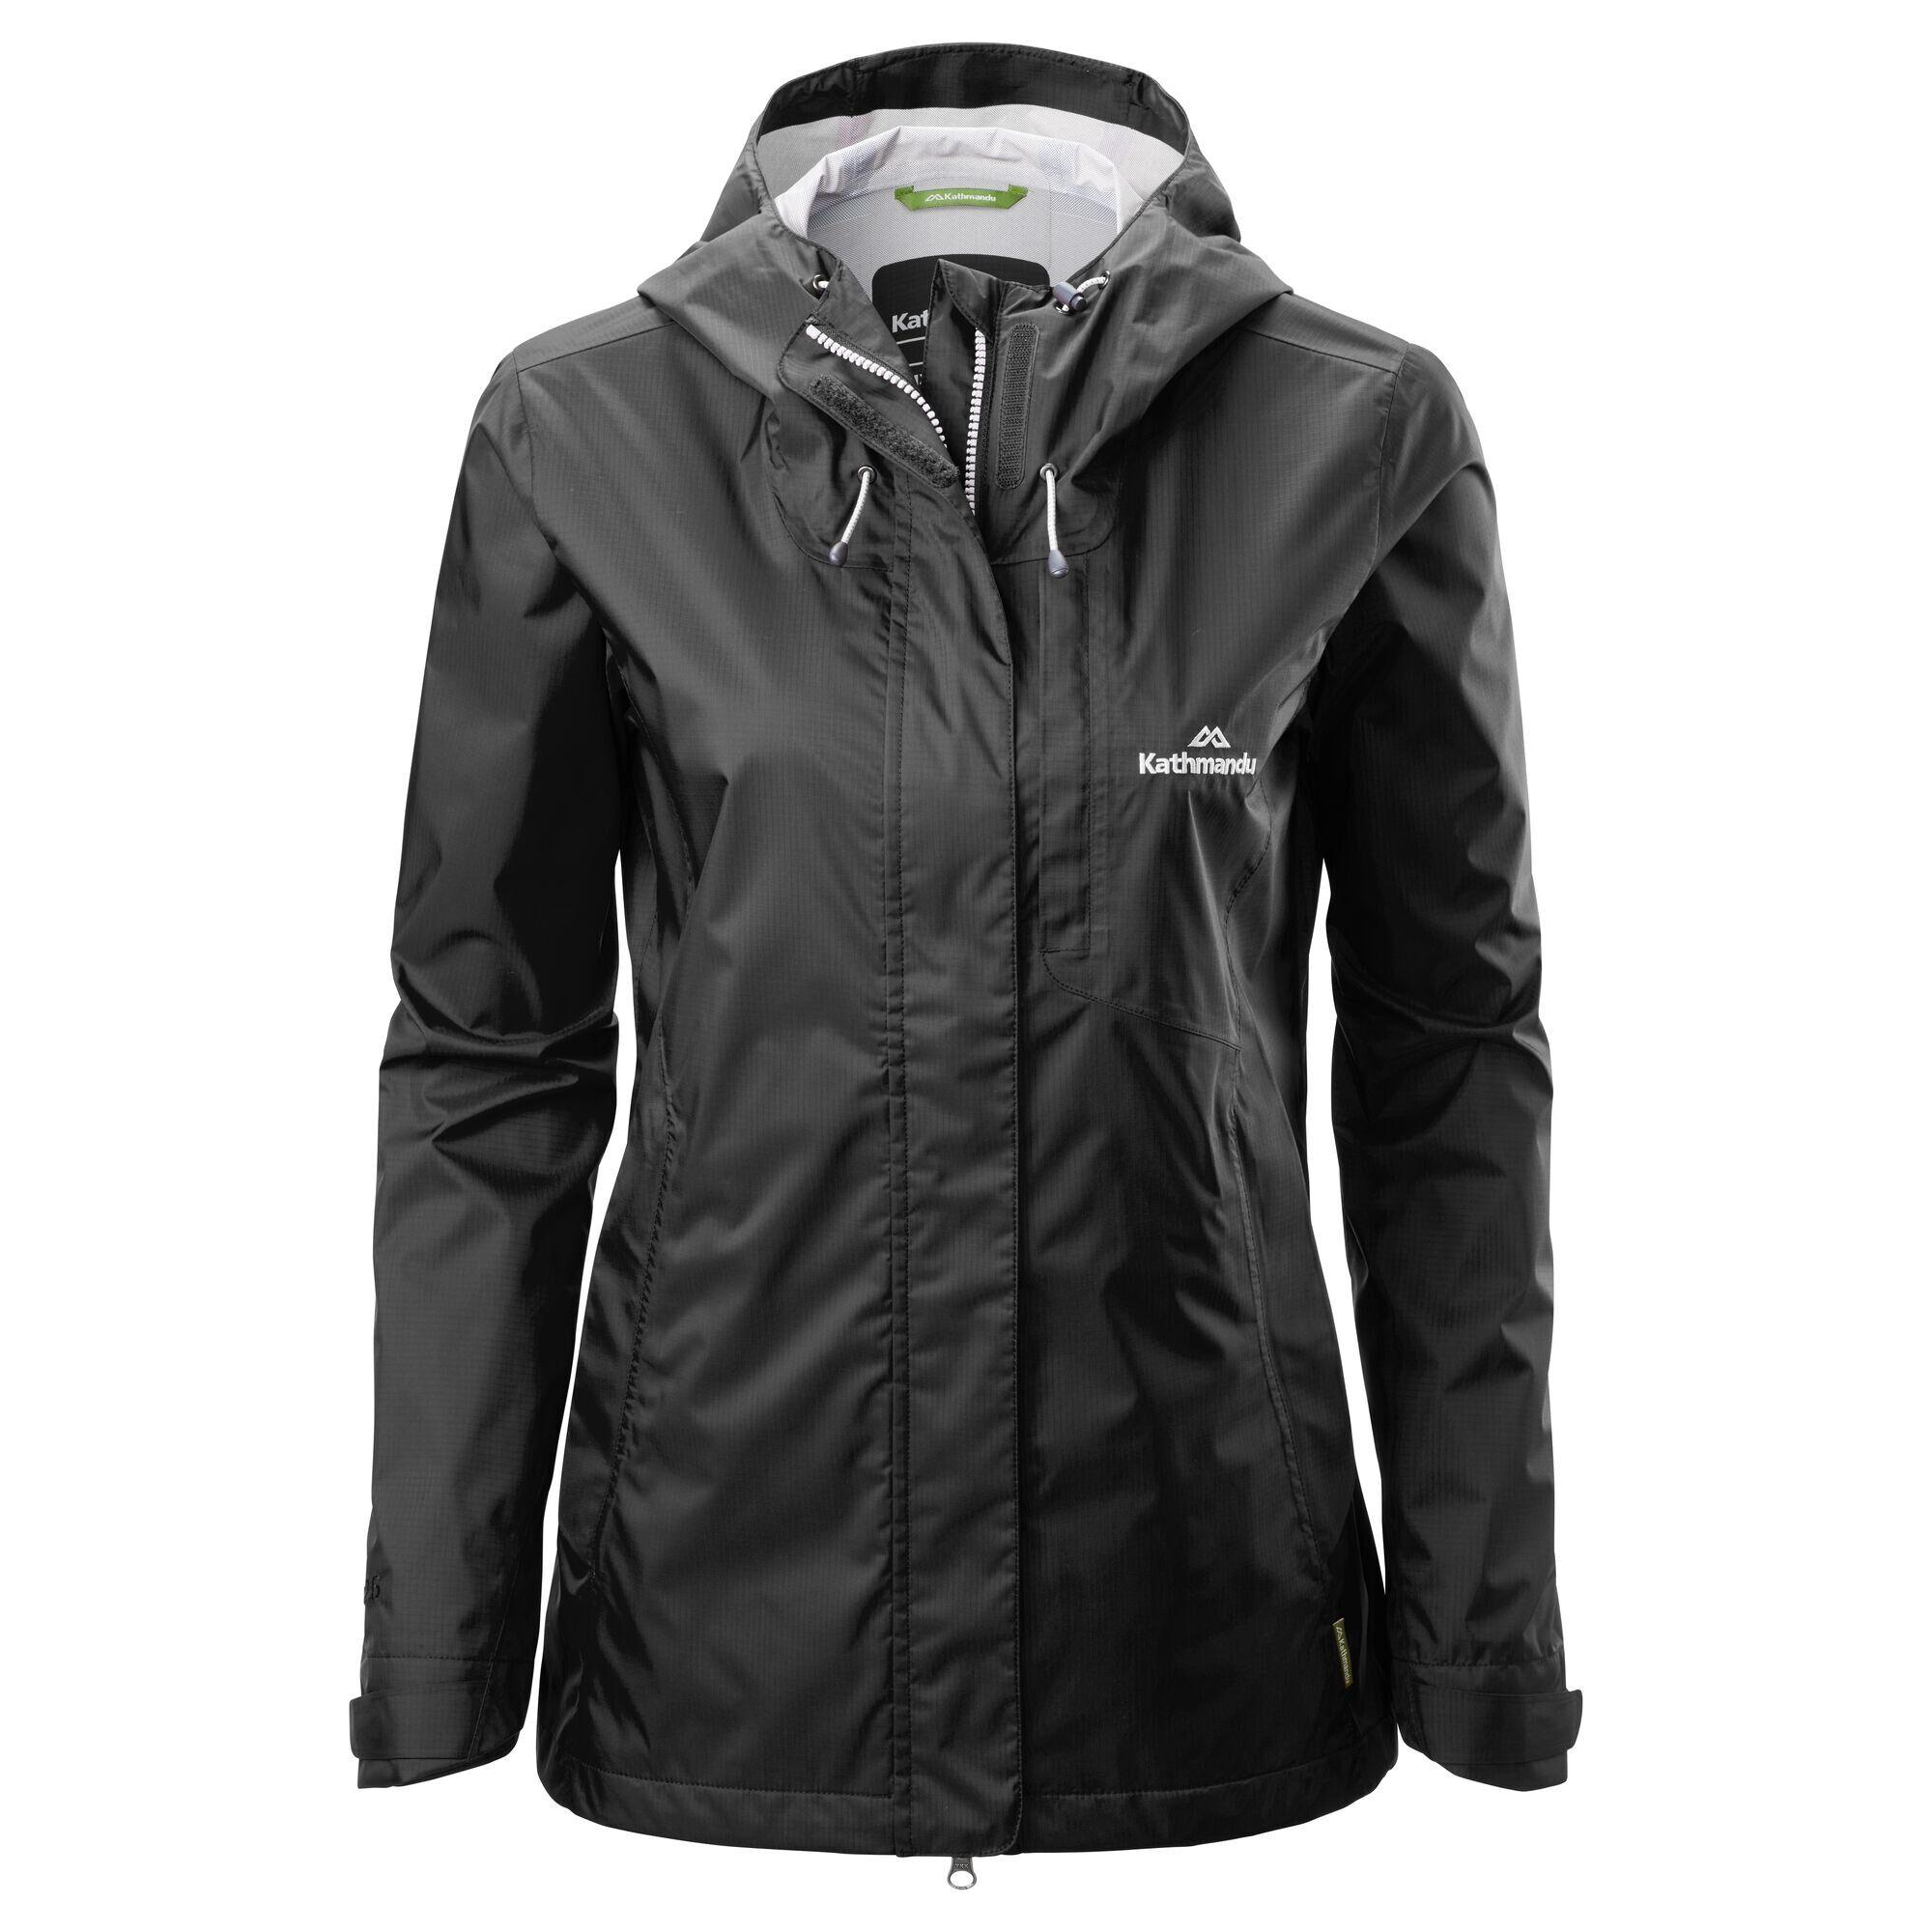 Kathmandu Trailhead Women's Rain Jacket  - Black - Size: US 12